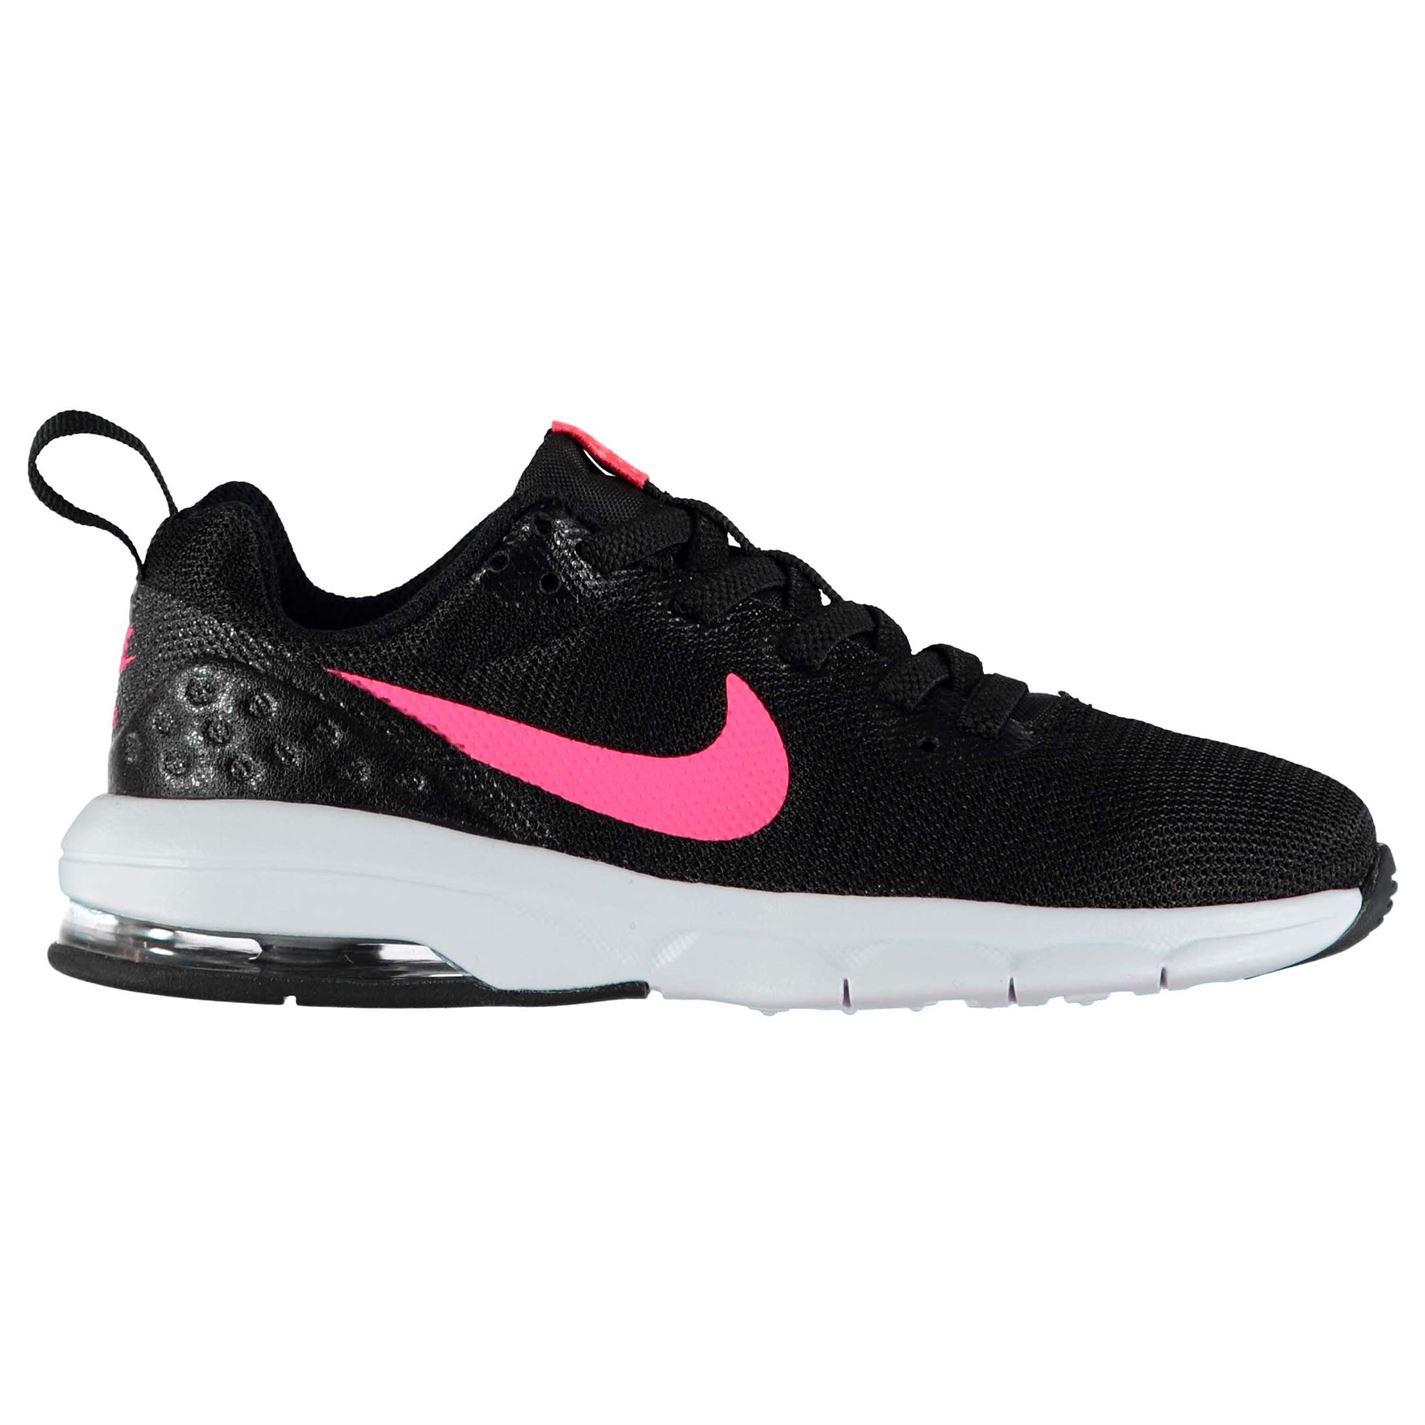 Nike Air Max Motion Lightweight Runners Child Girls